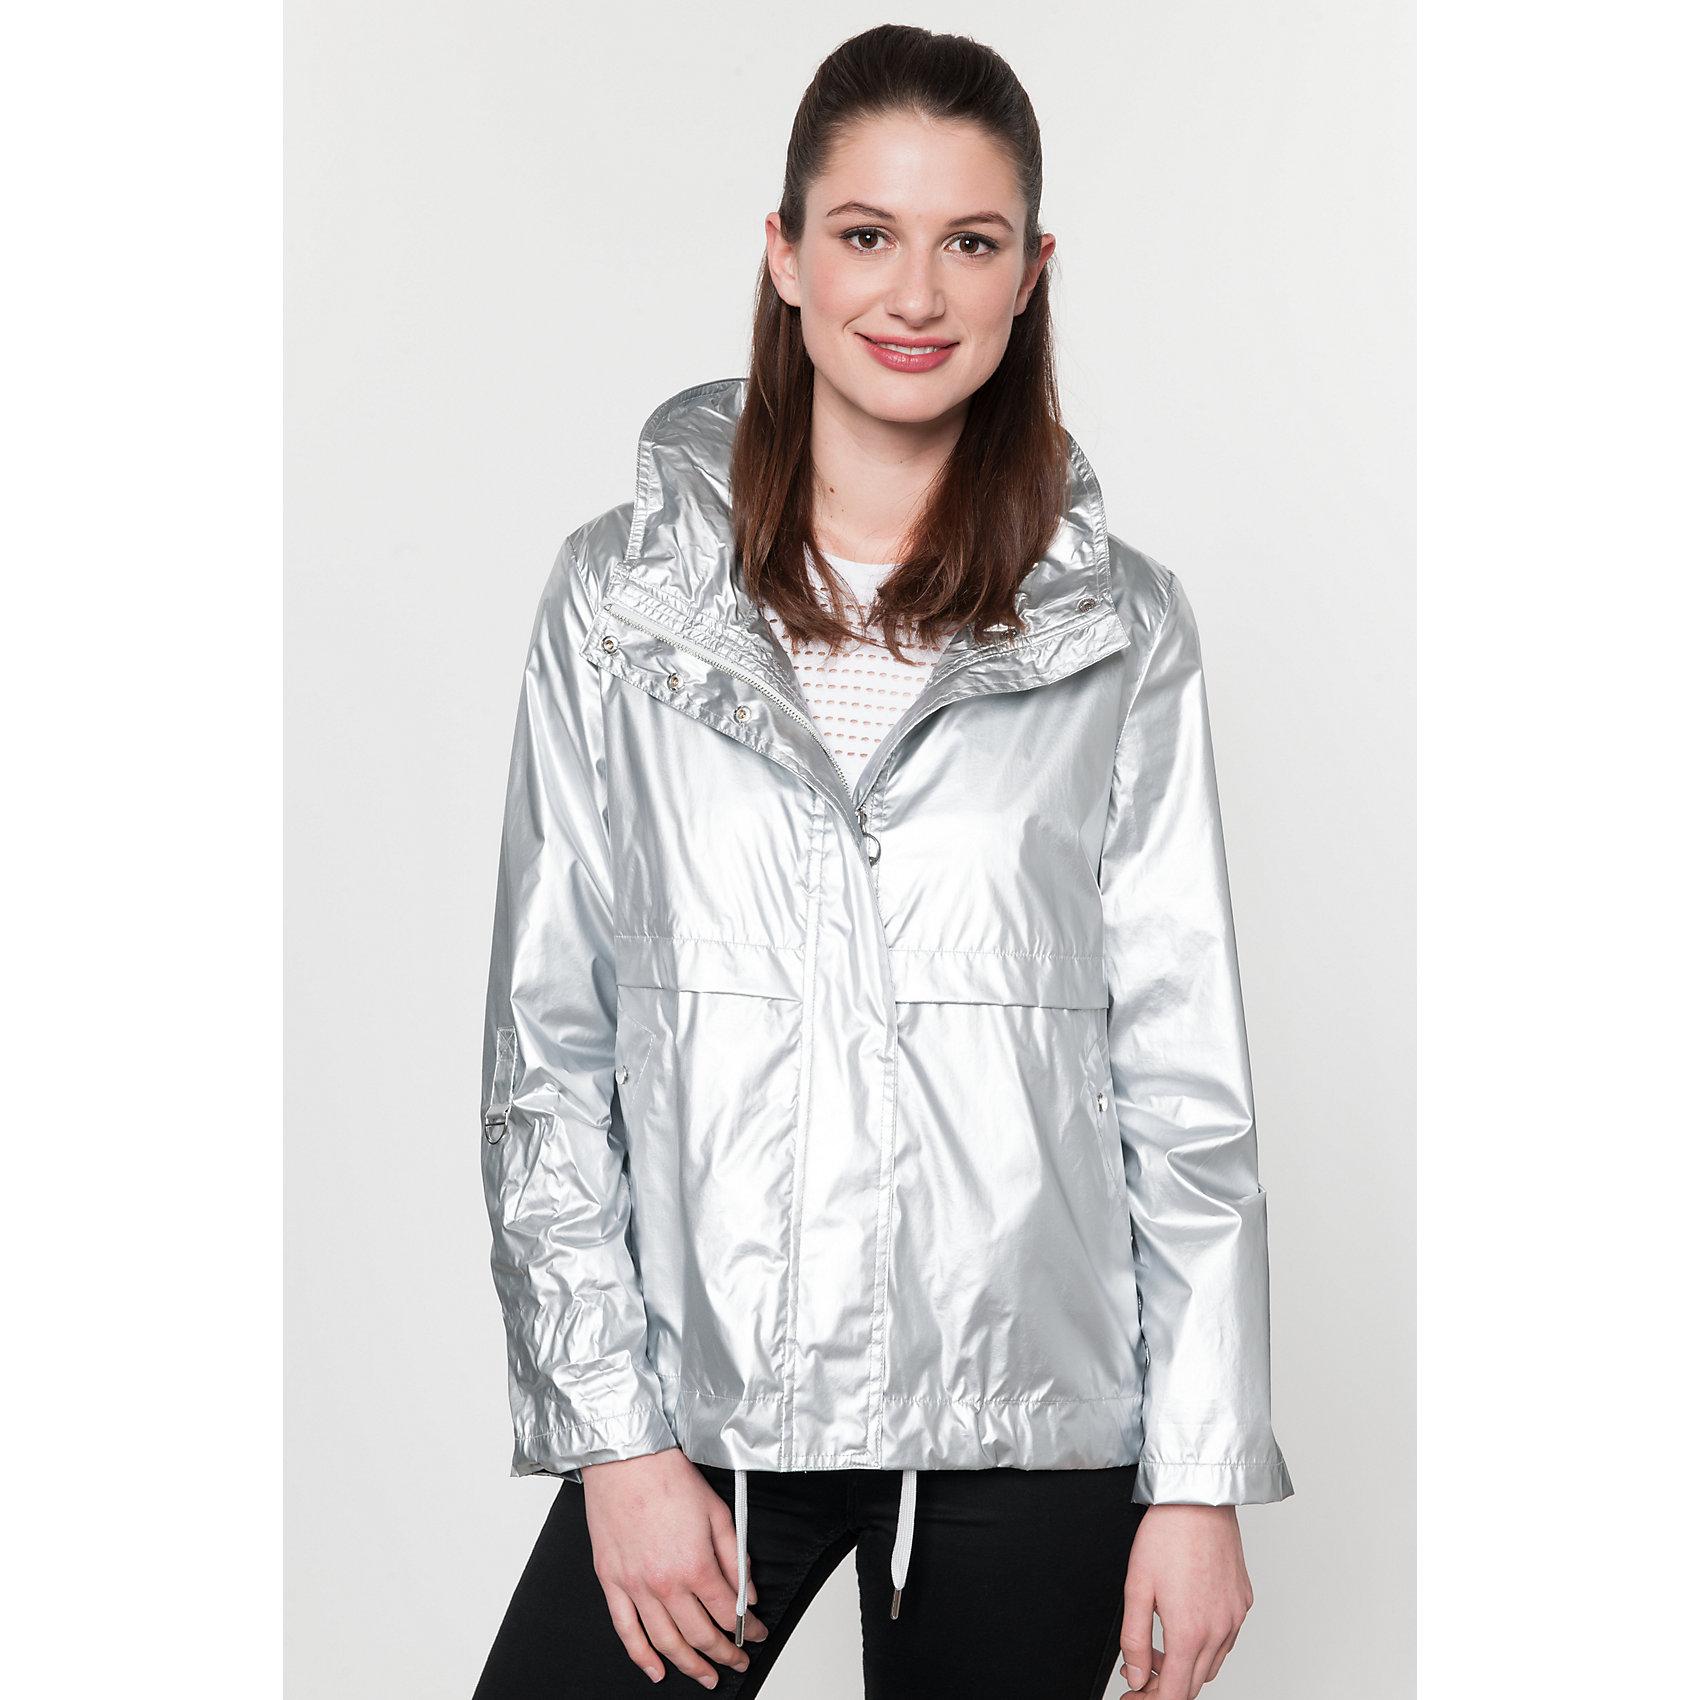 Neu TOM TAILOR Jacke 7304989 für Damen grau   eBay 85a676106d